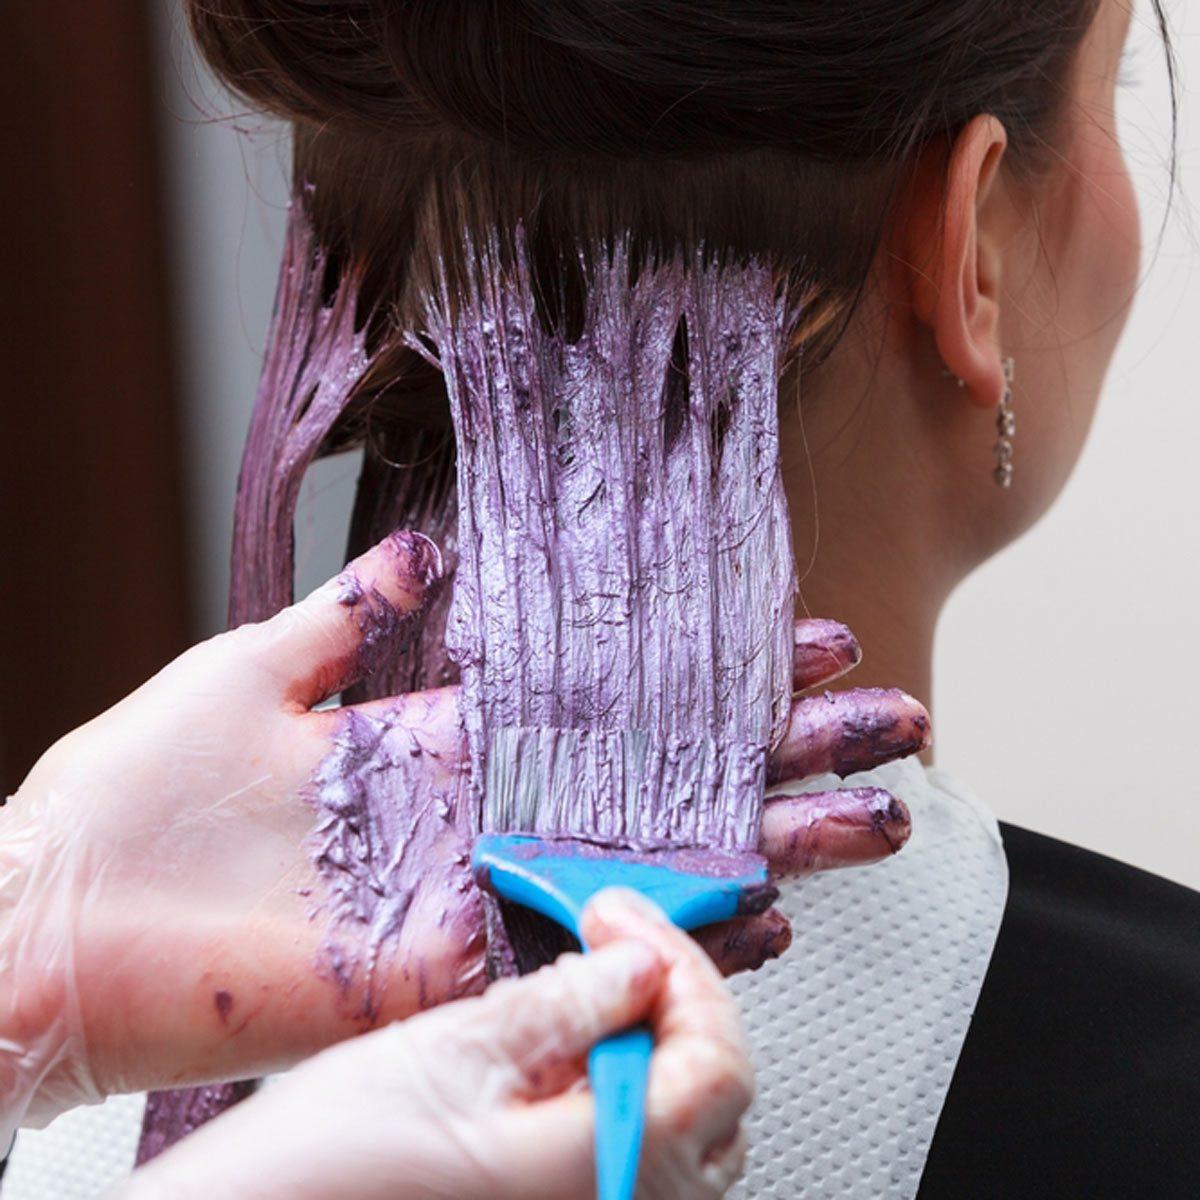 Clean Up Messy Hair Dye